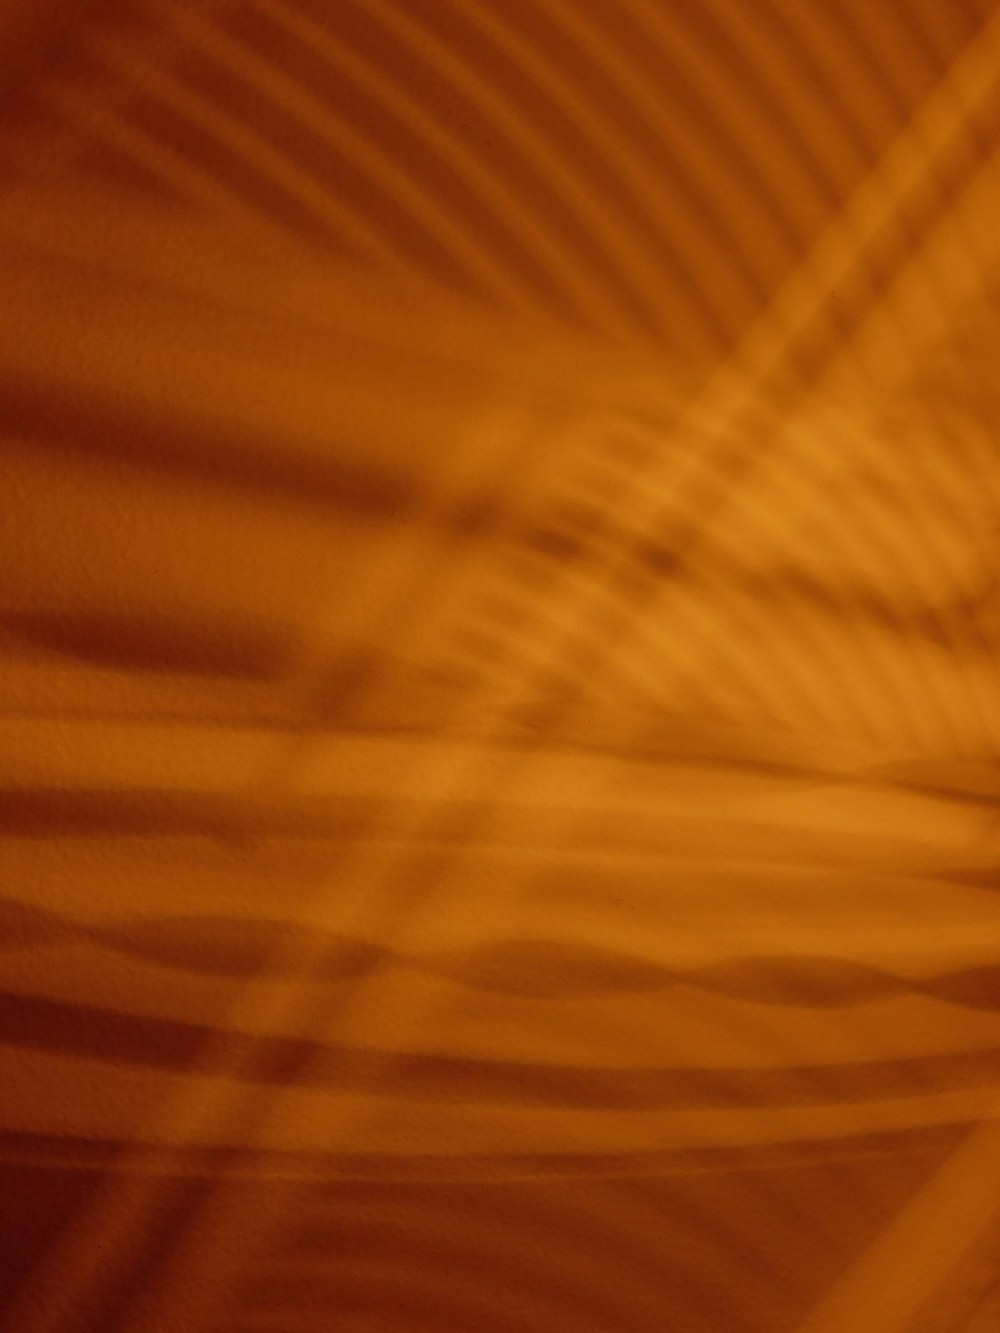 lignes dorées - golden lines